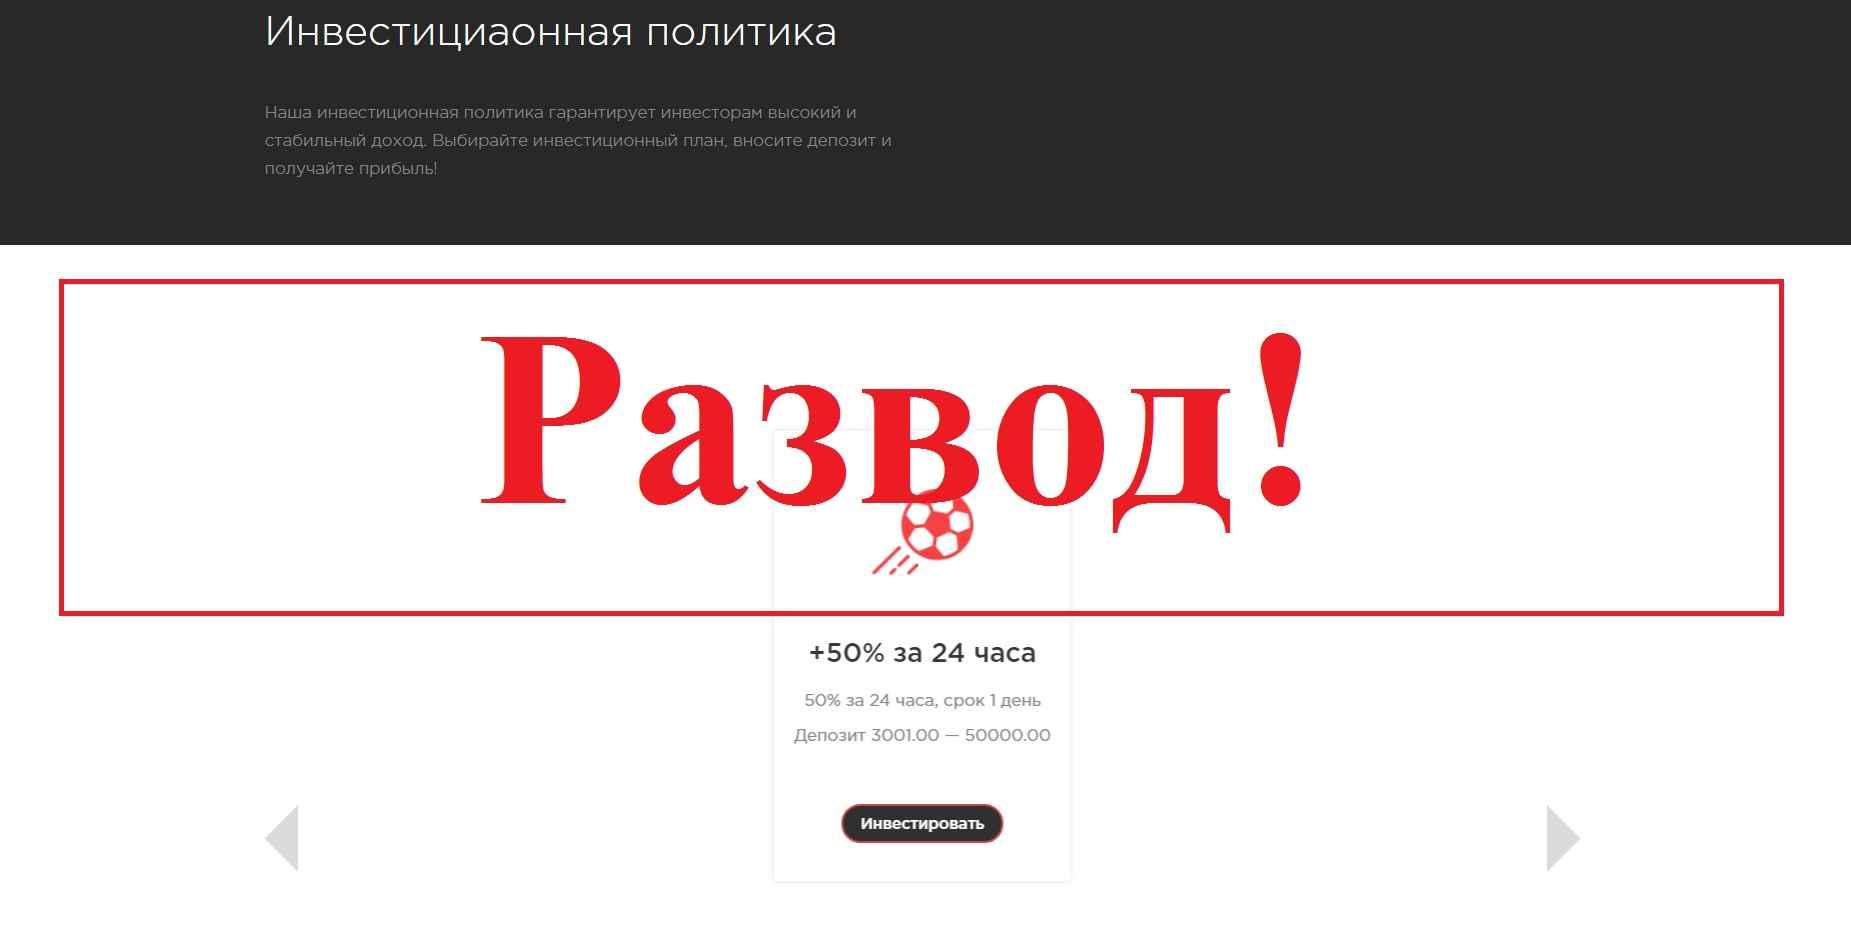 Baltber – инвестиции в спорт. Отзывы о baltber.info